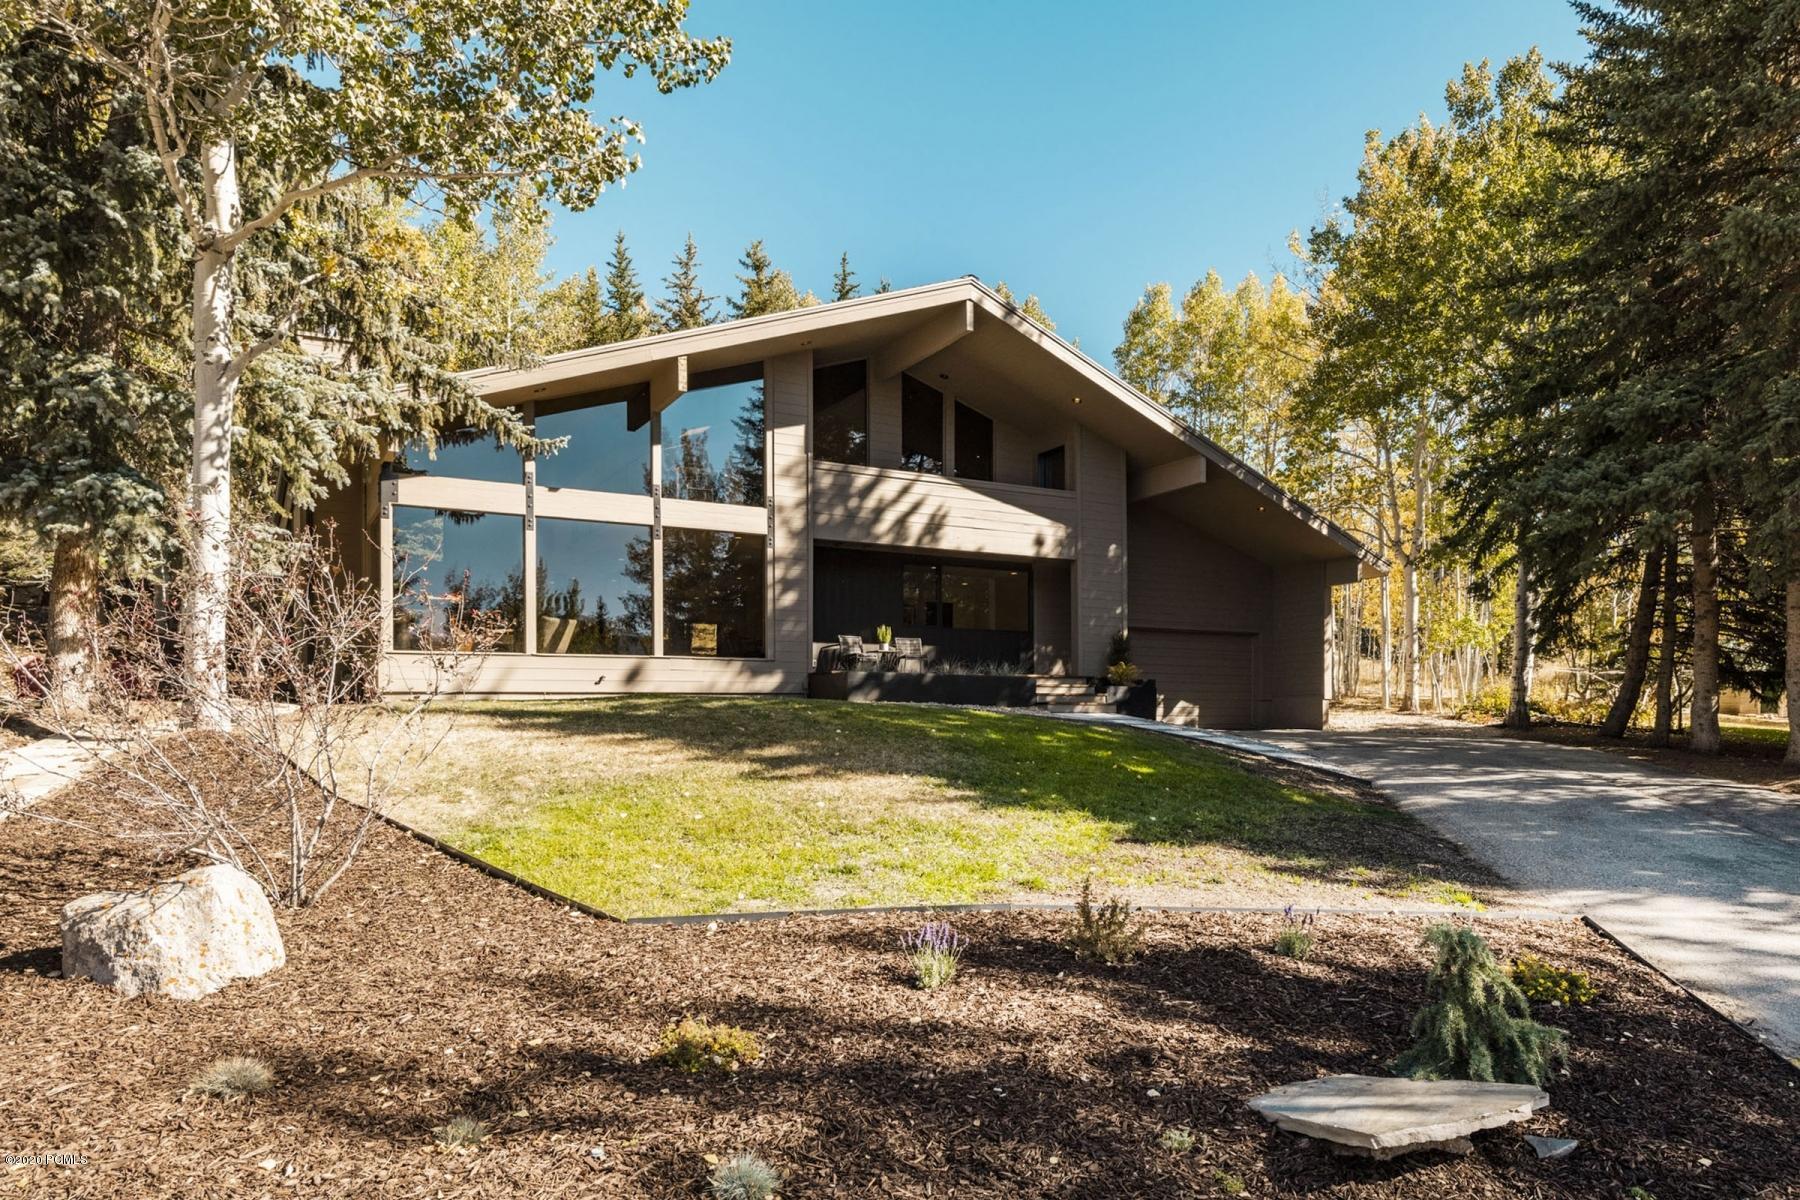 3320 Crestline Drive, Park City, Utah 84060, 3 Bedrooms Bedrooms, ,3 BathroomsBathrooms,Single Family,For Sale,Crestline,12003797